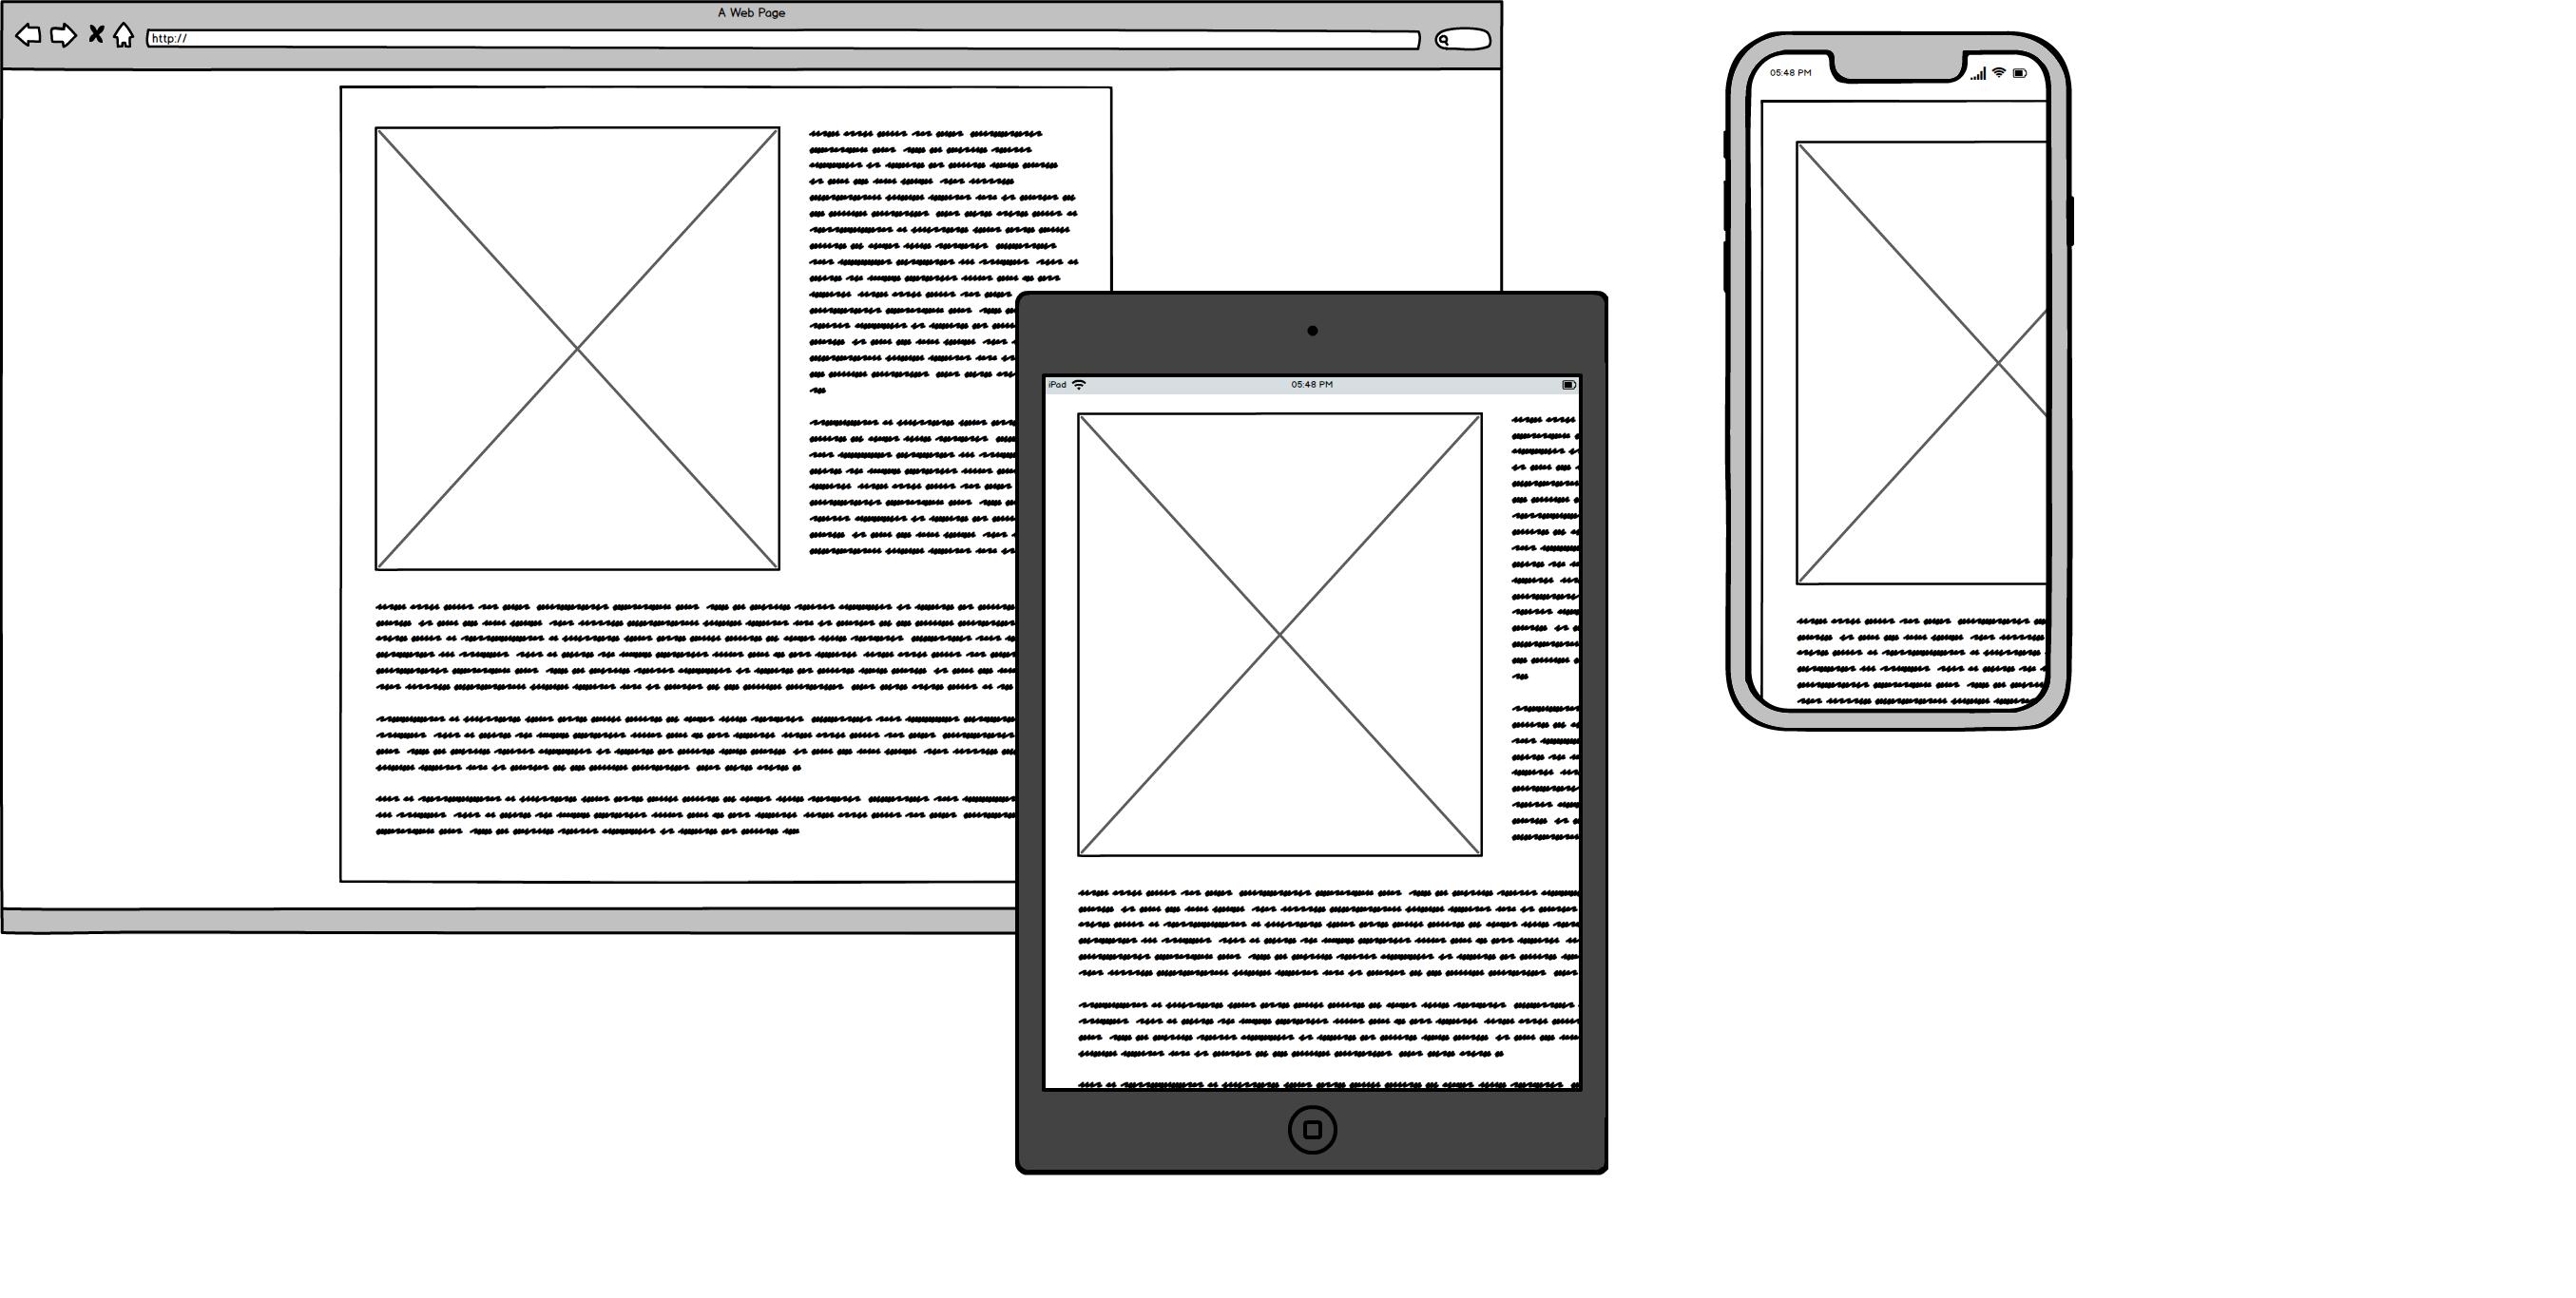 pdf/images/sizing.png